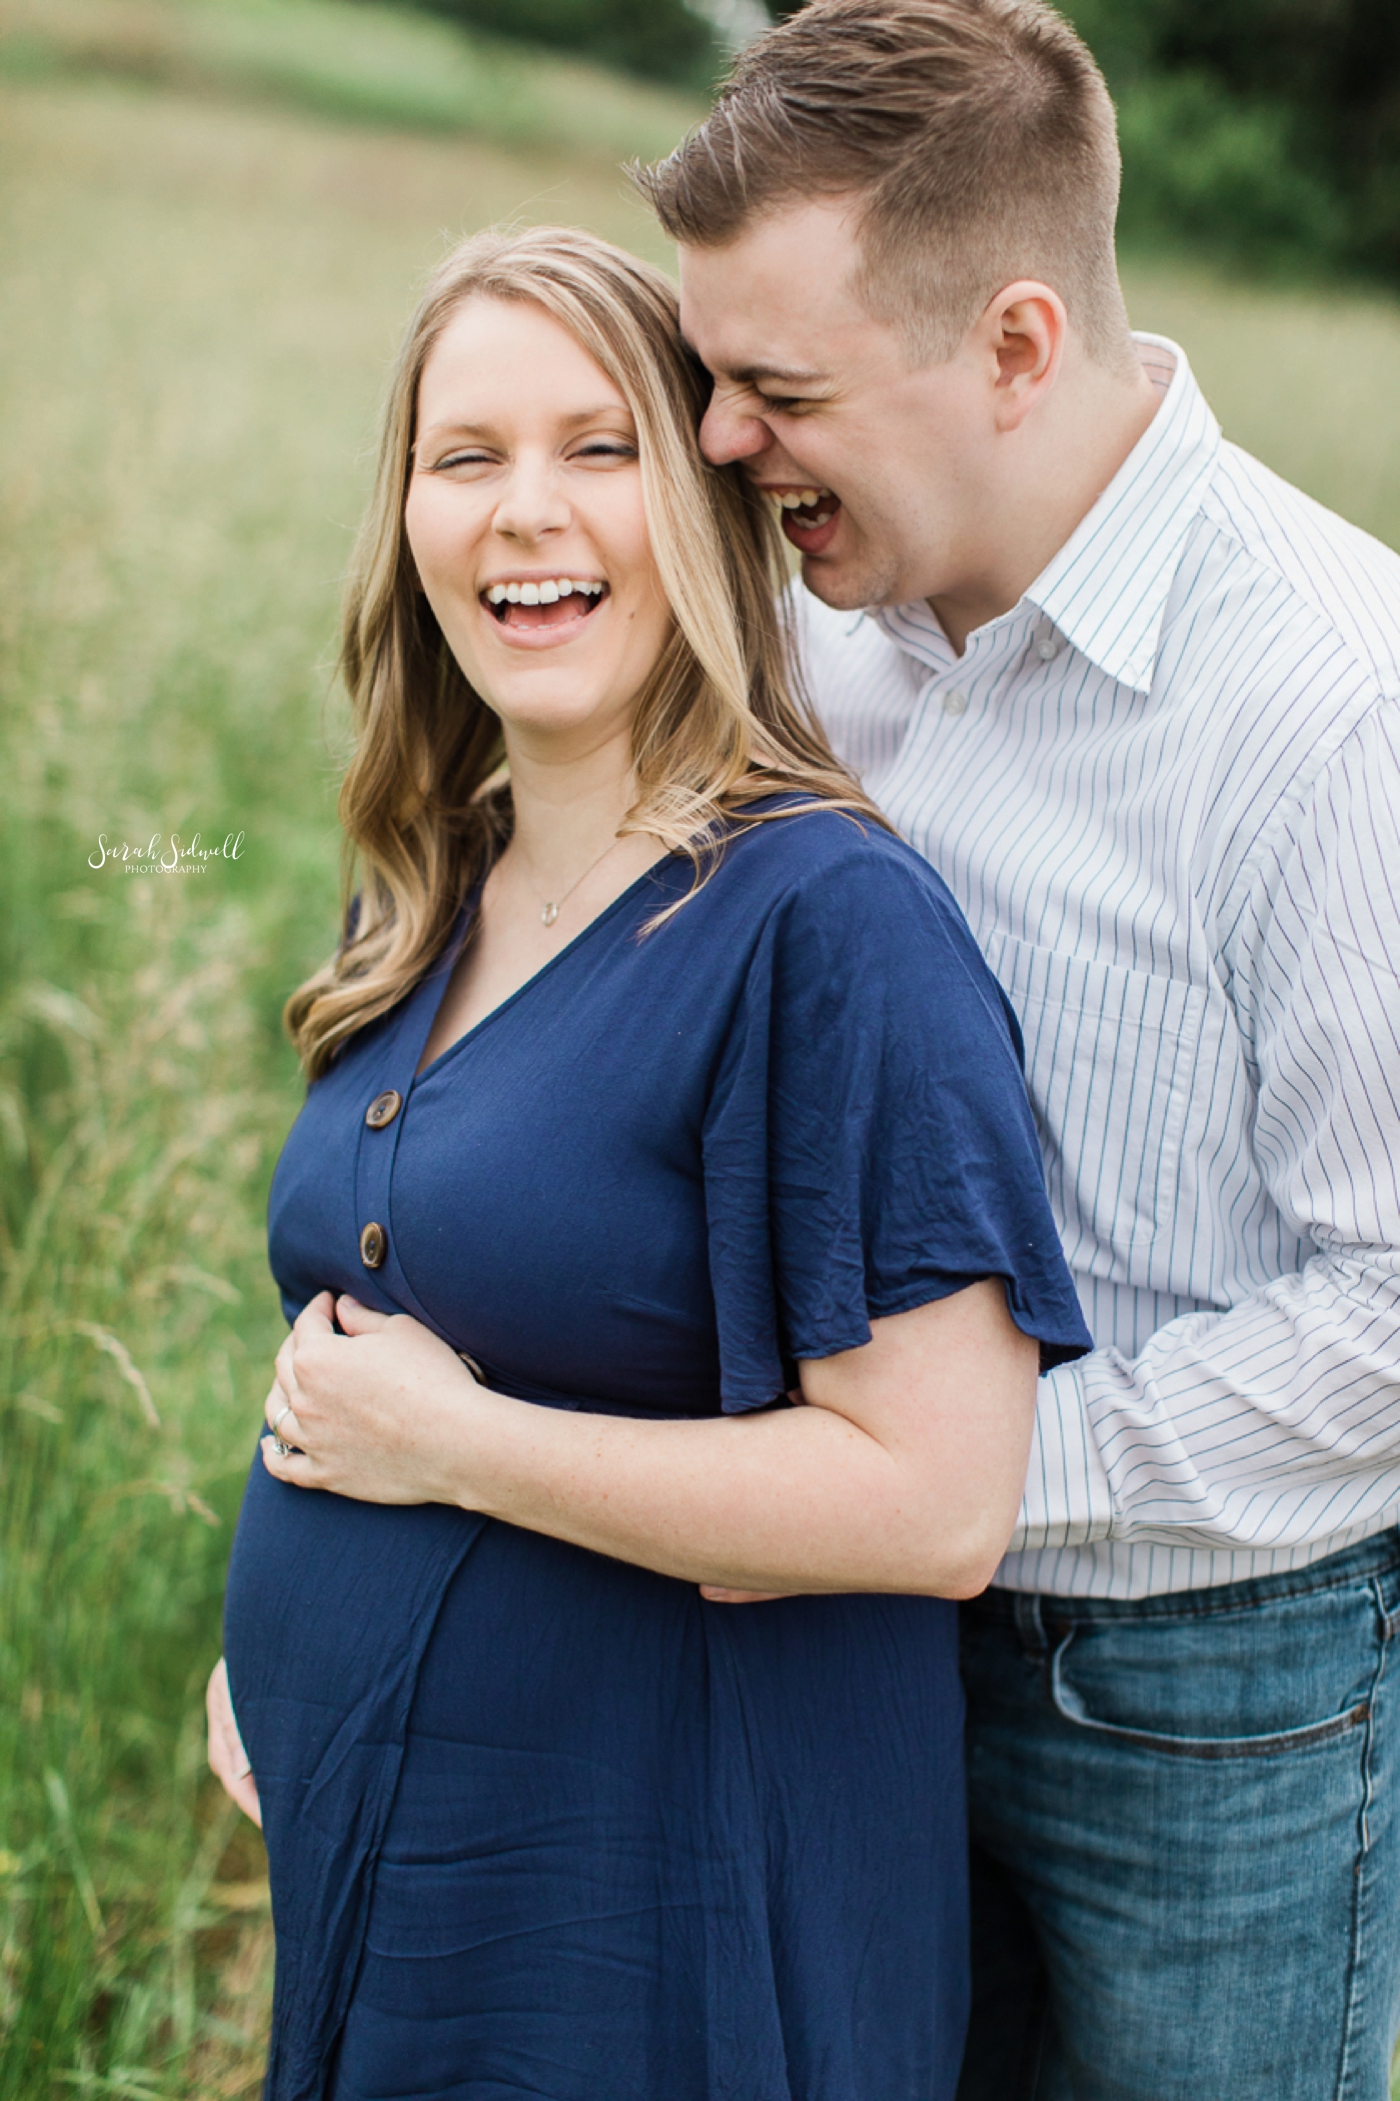 Maternity Session Sneak Peak | Daphne